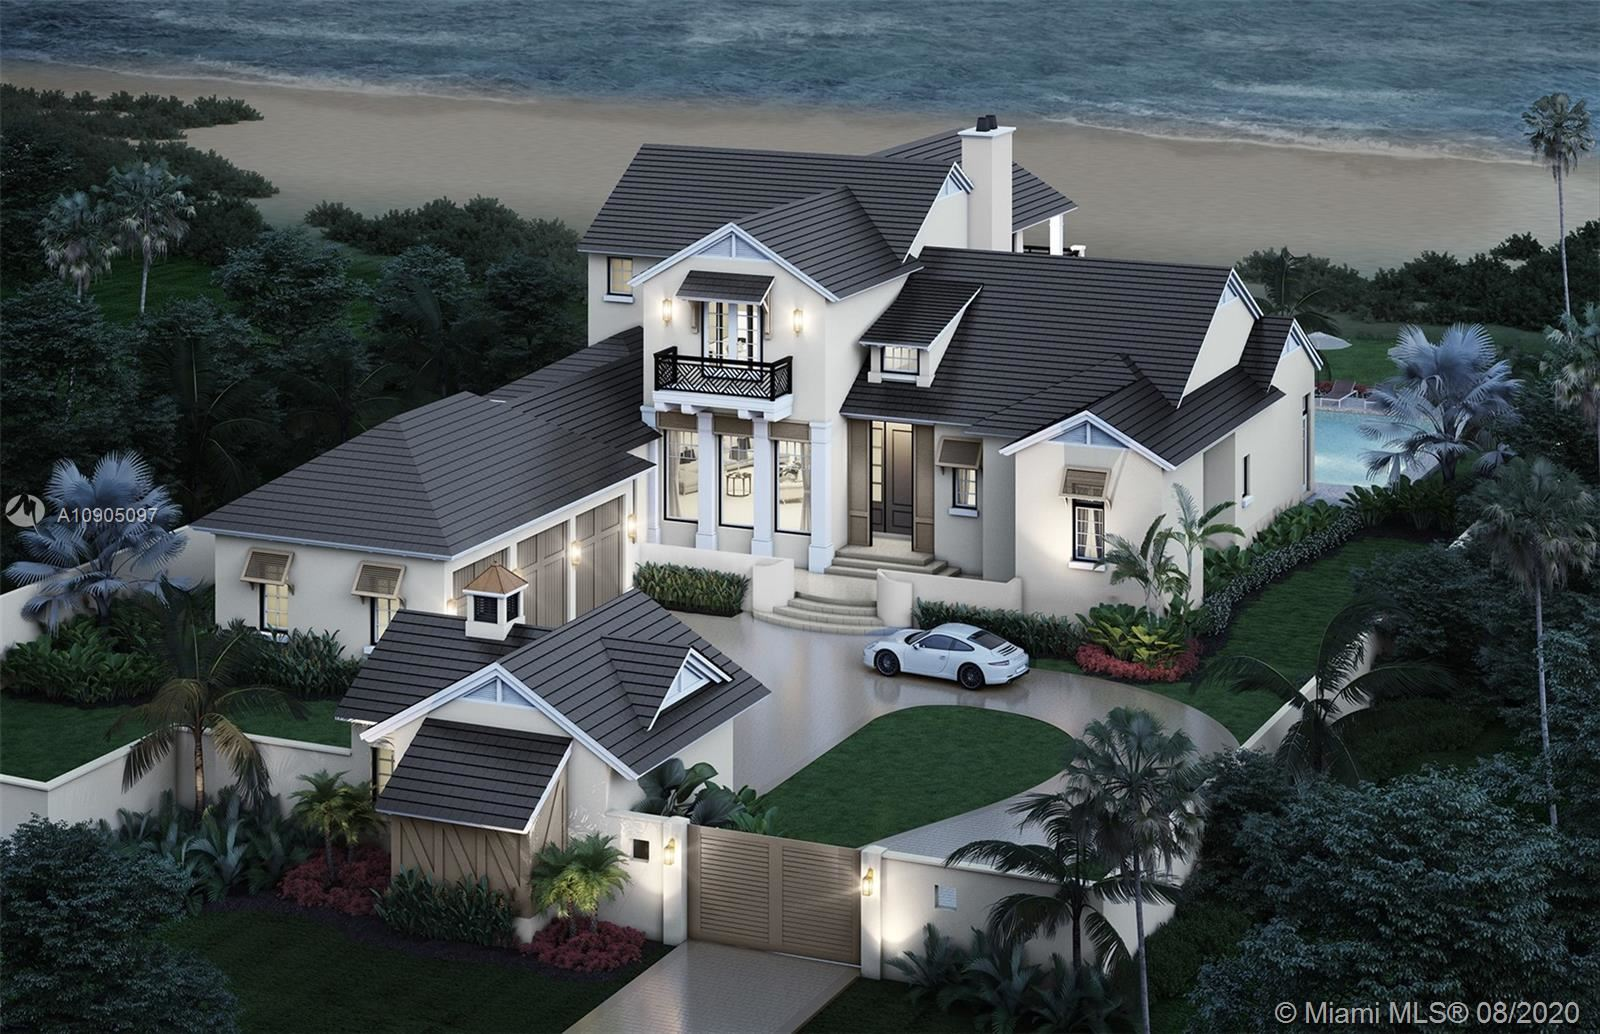 3565 N Ocean Blvd, Gulf Stream, FL 33483 - #: A10905097